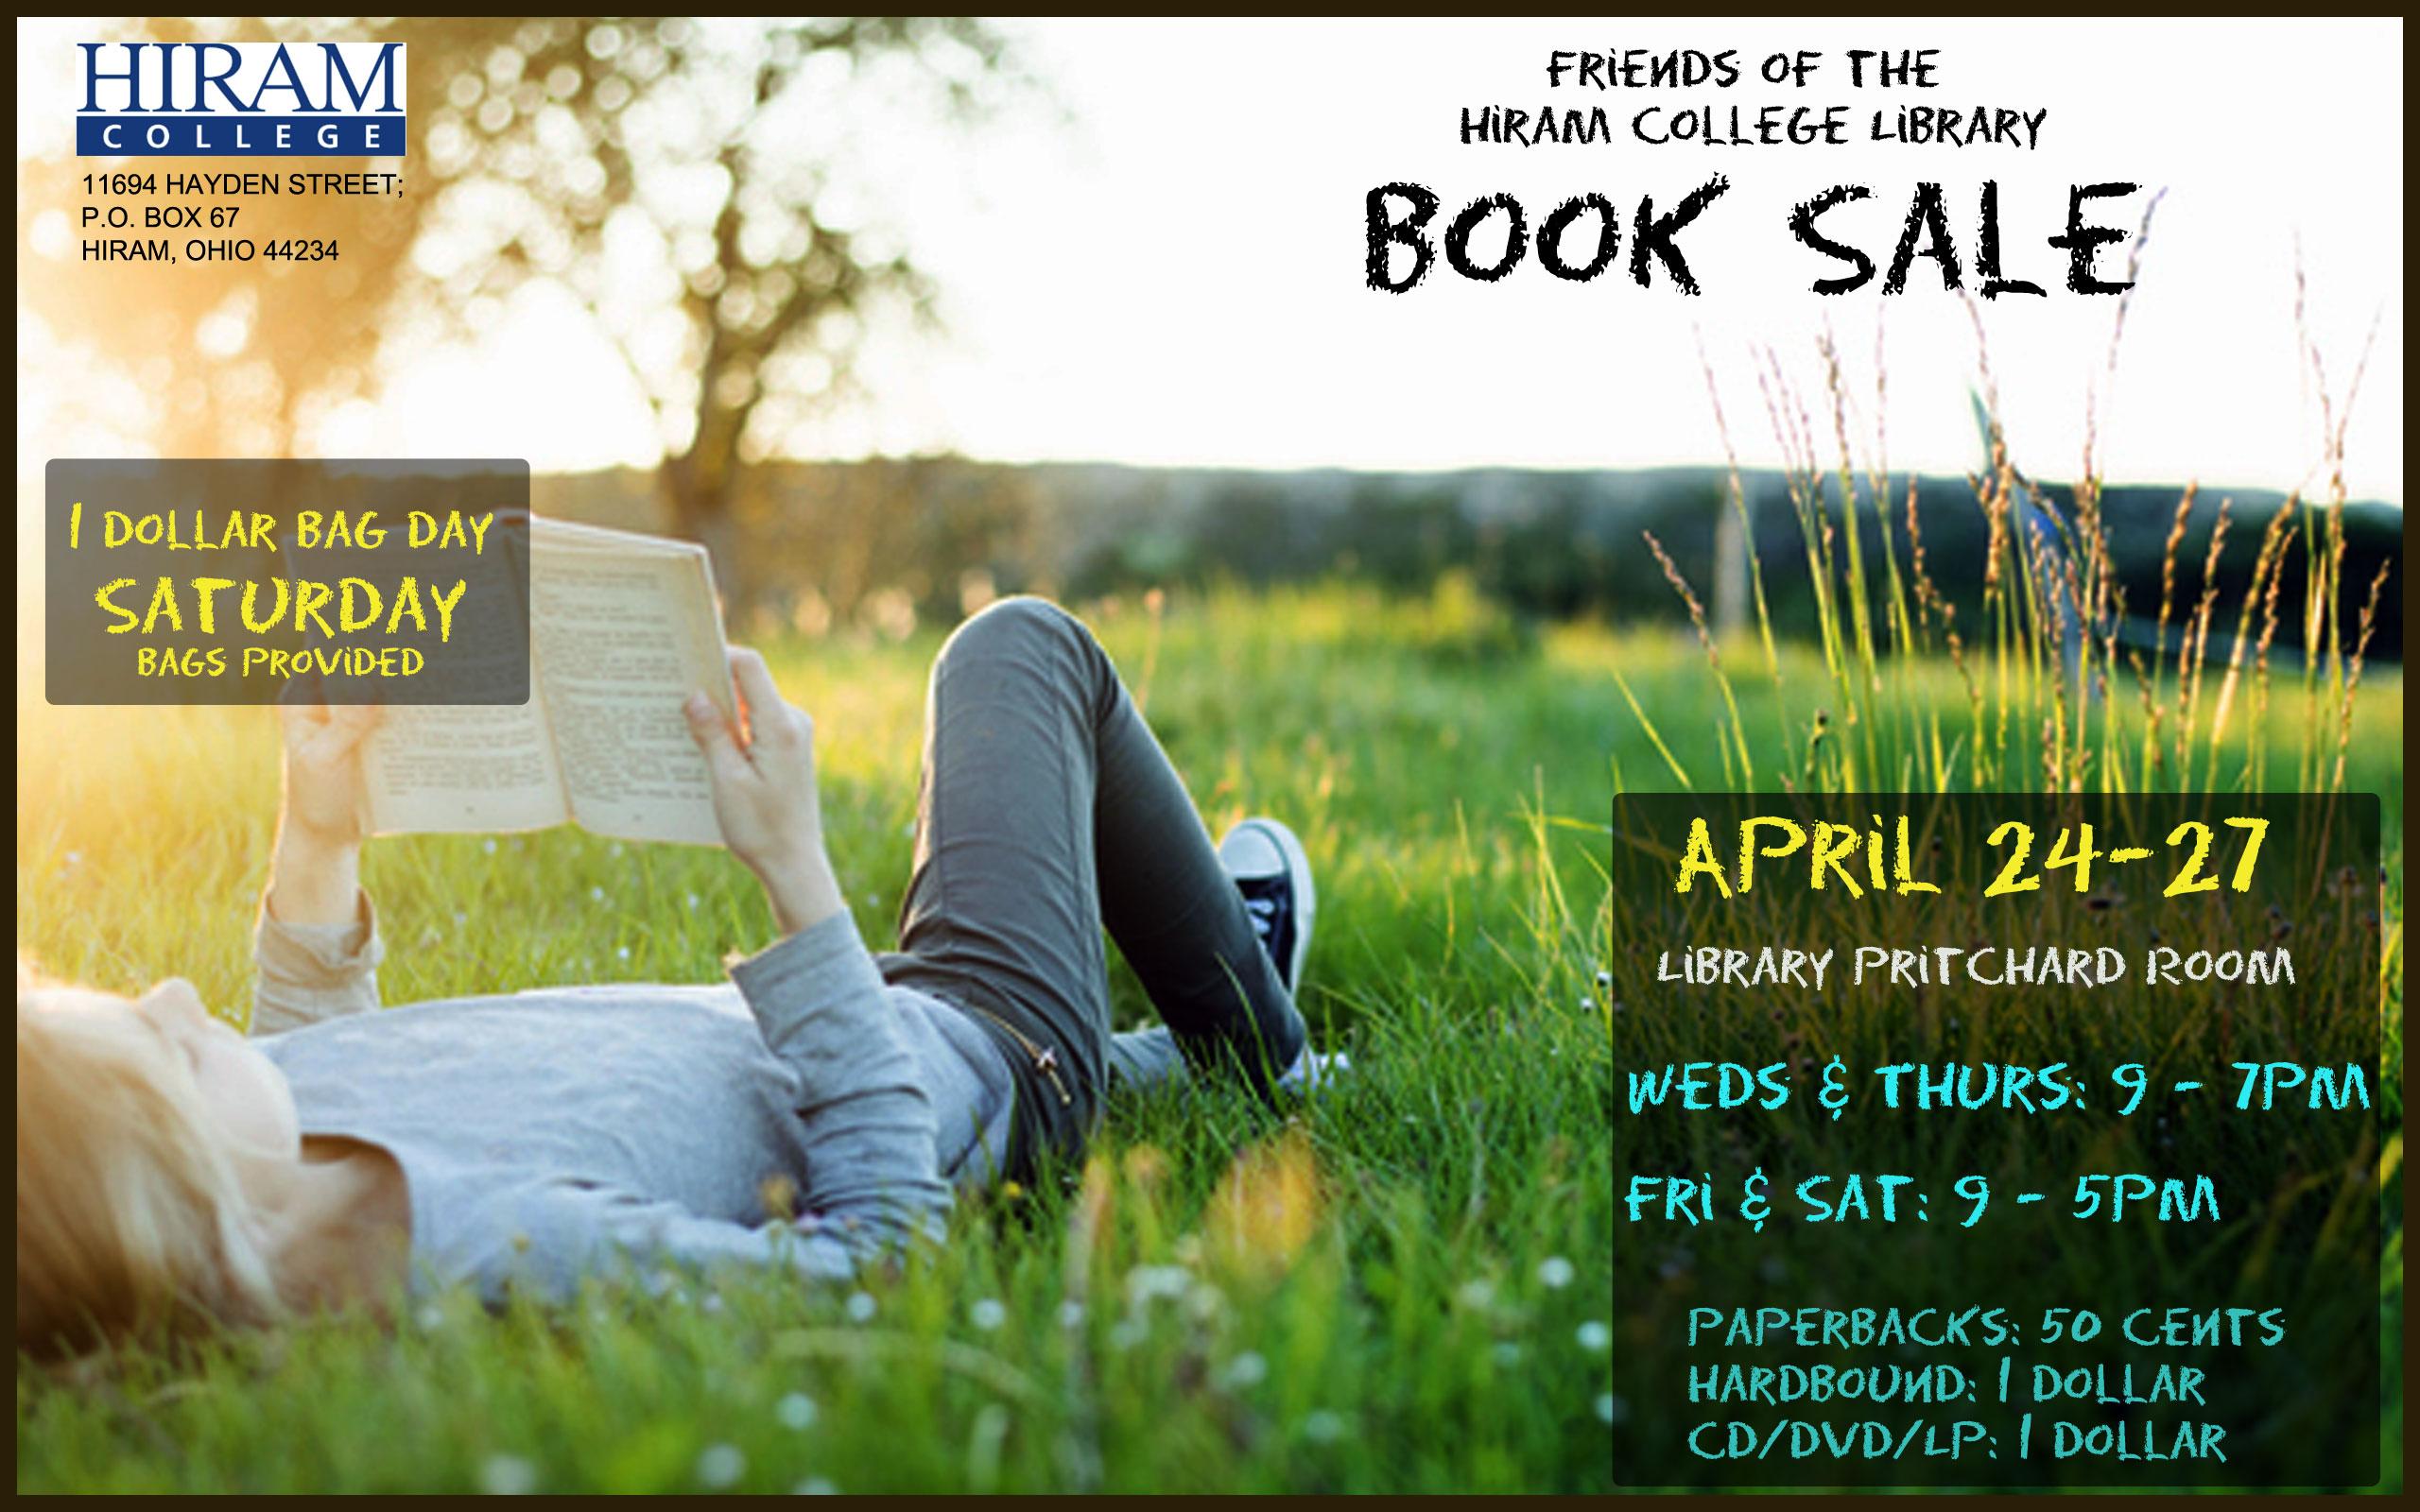 Book Sale image April 17th